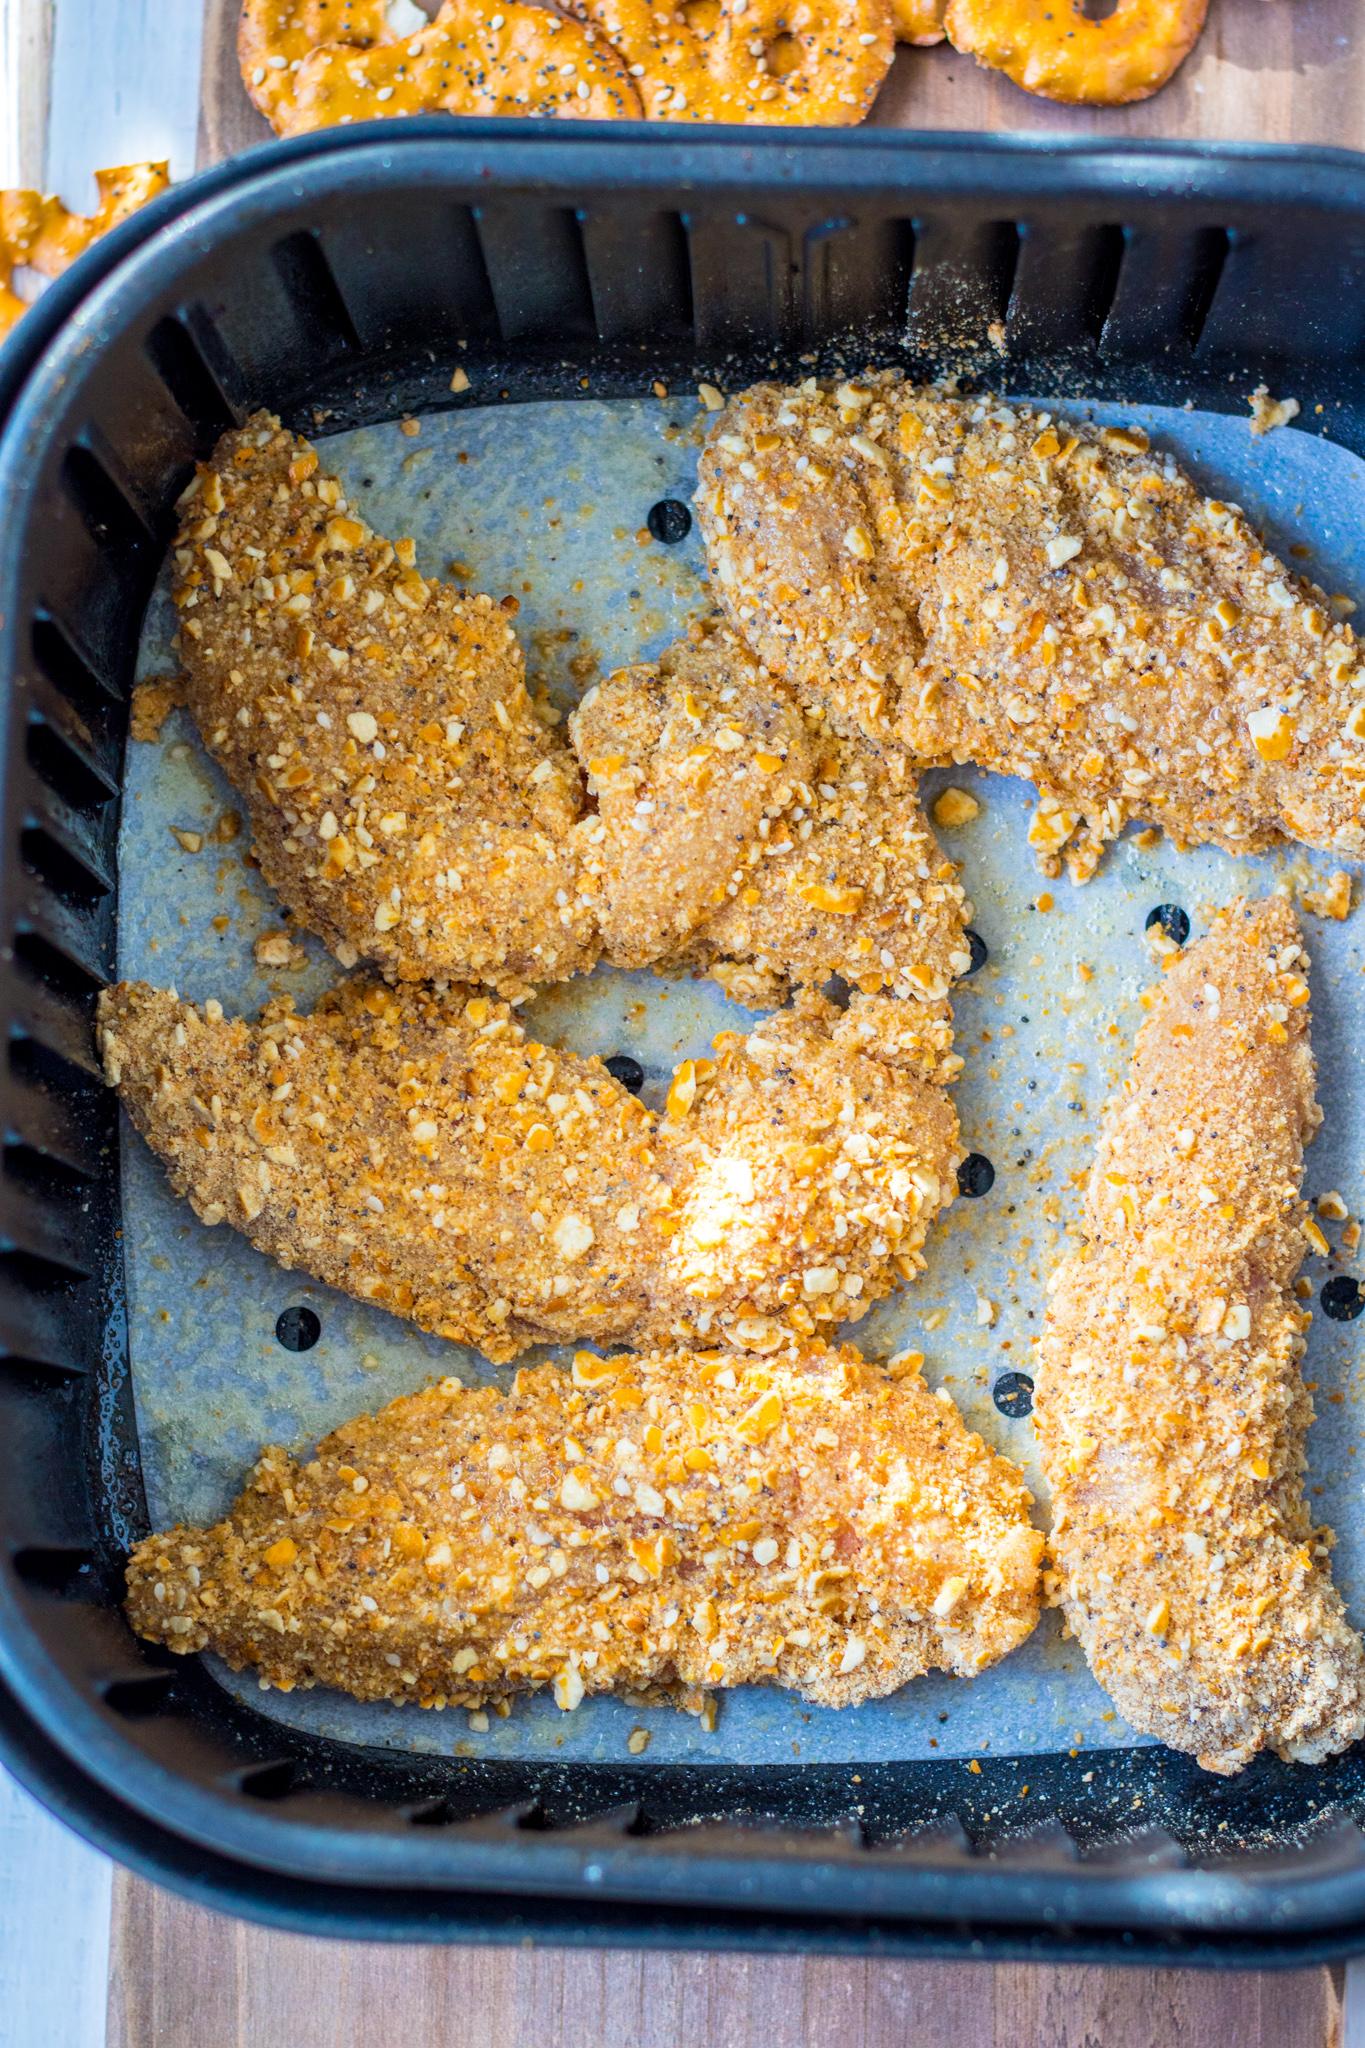 Pretzel Crusted Chicken Recipe in the air fryer.